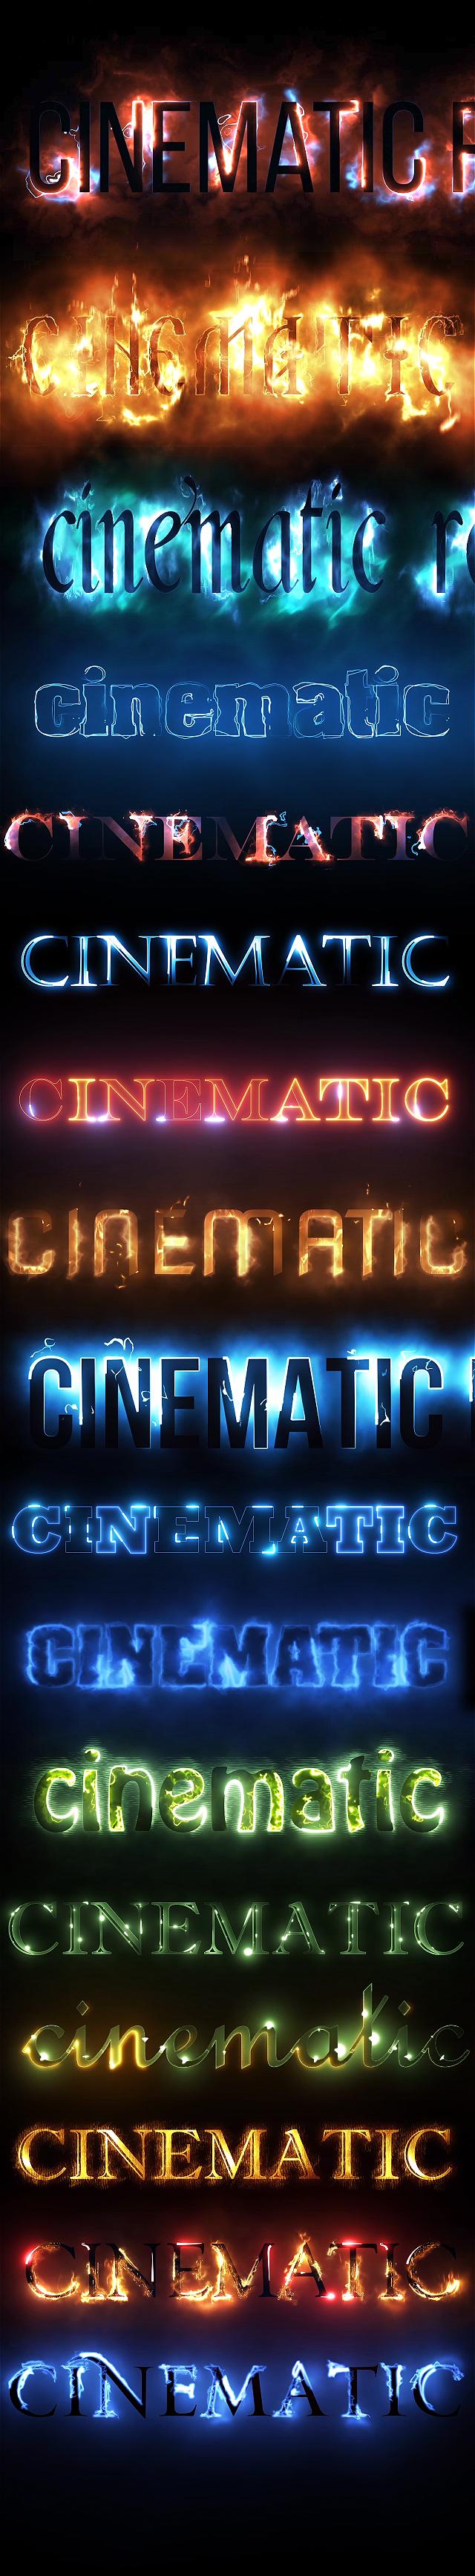 28068870951_3c229efcc3_o AE模板:火焰燃烧闪电光效电影文字标题logo展示 Cinematic Text Styles Pack